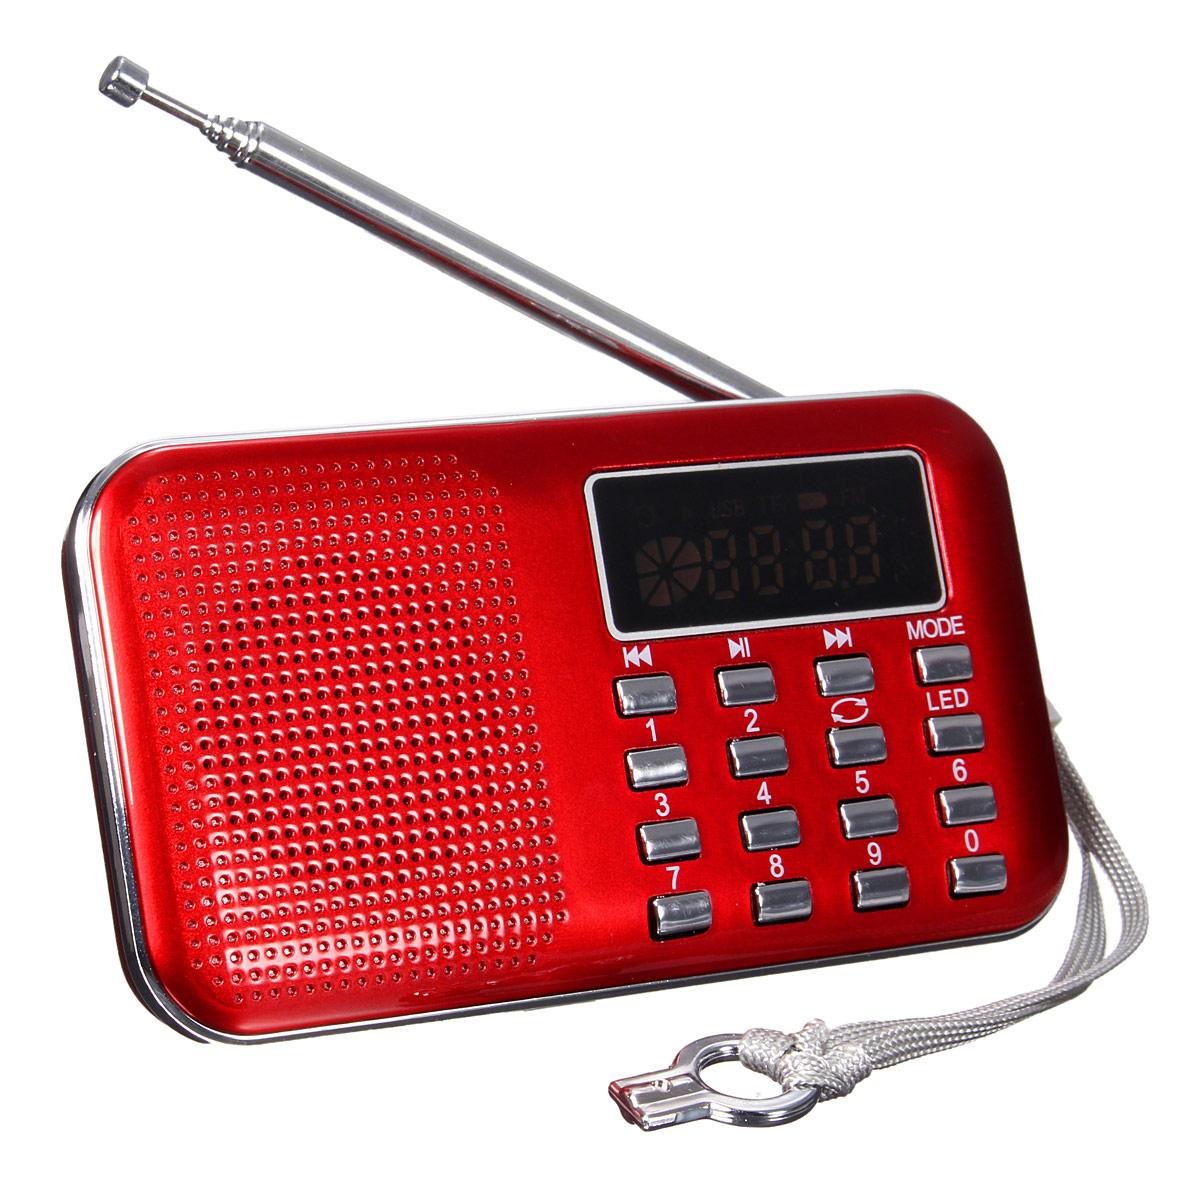 mini portable lcd digital fm radio speaker usb micro sd tf card mp3 music player eur 11 35. Black Bedroom Furniture Sets. Home Design Ideas